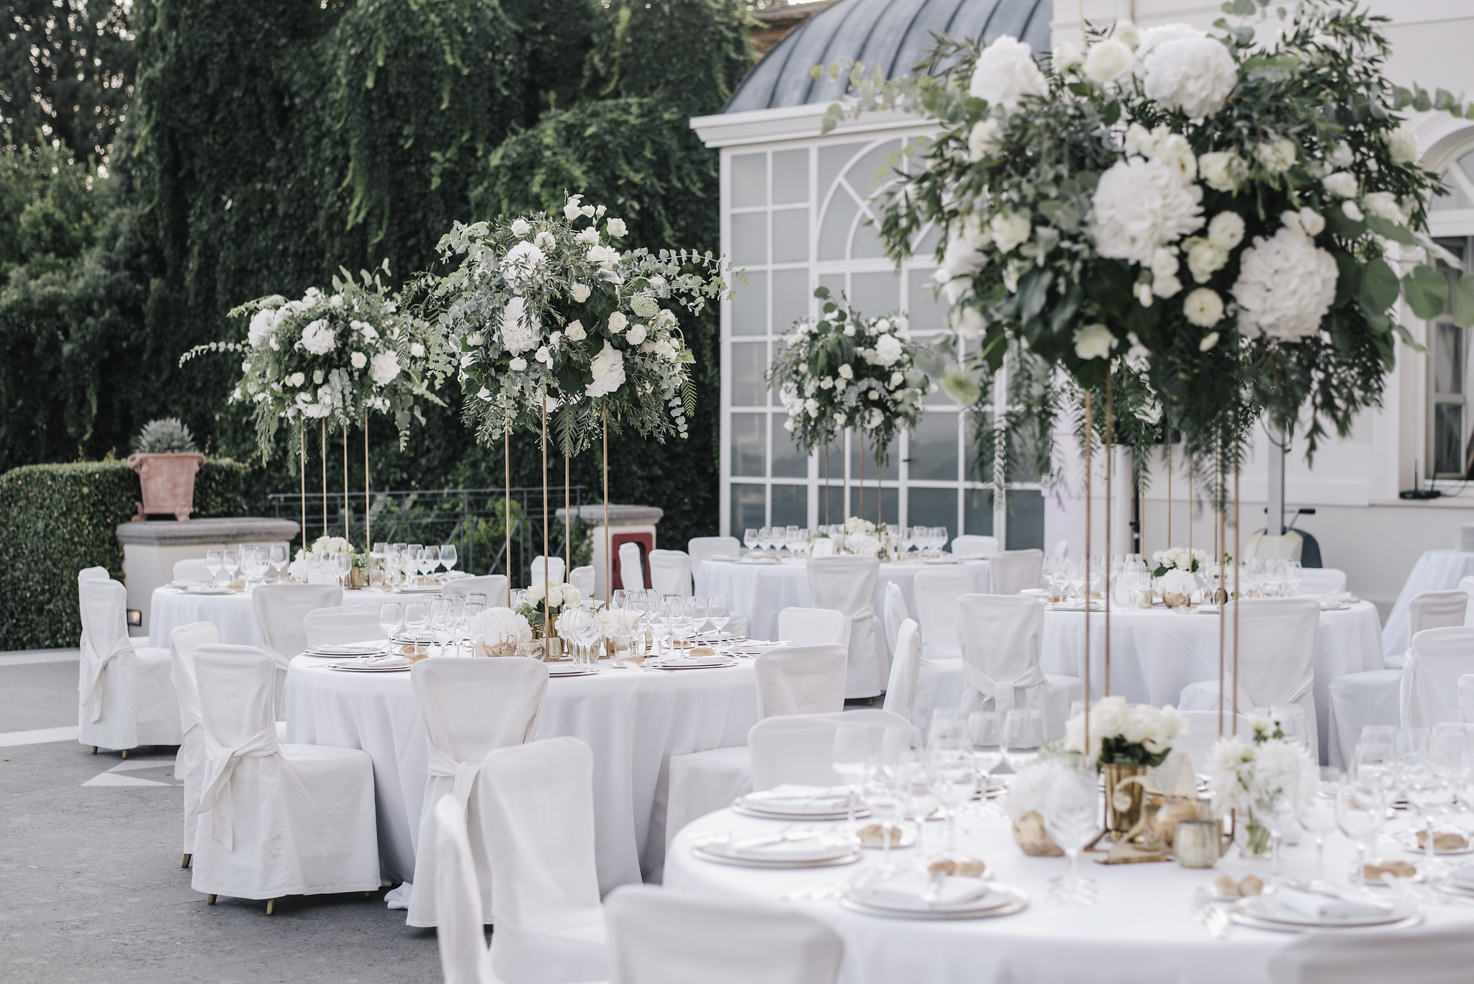 Outdoor wedding banquet at Villa Miani